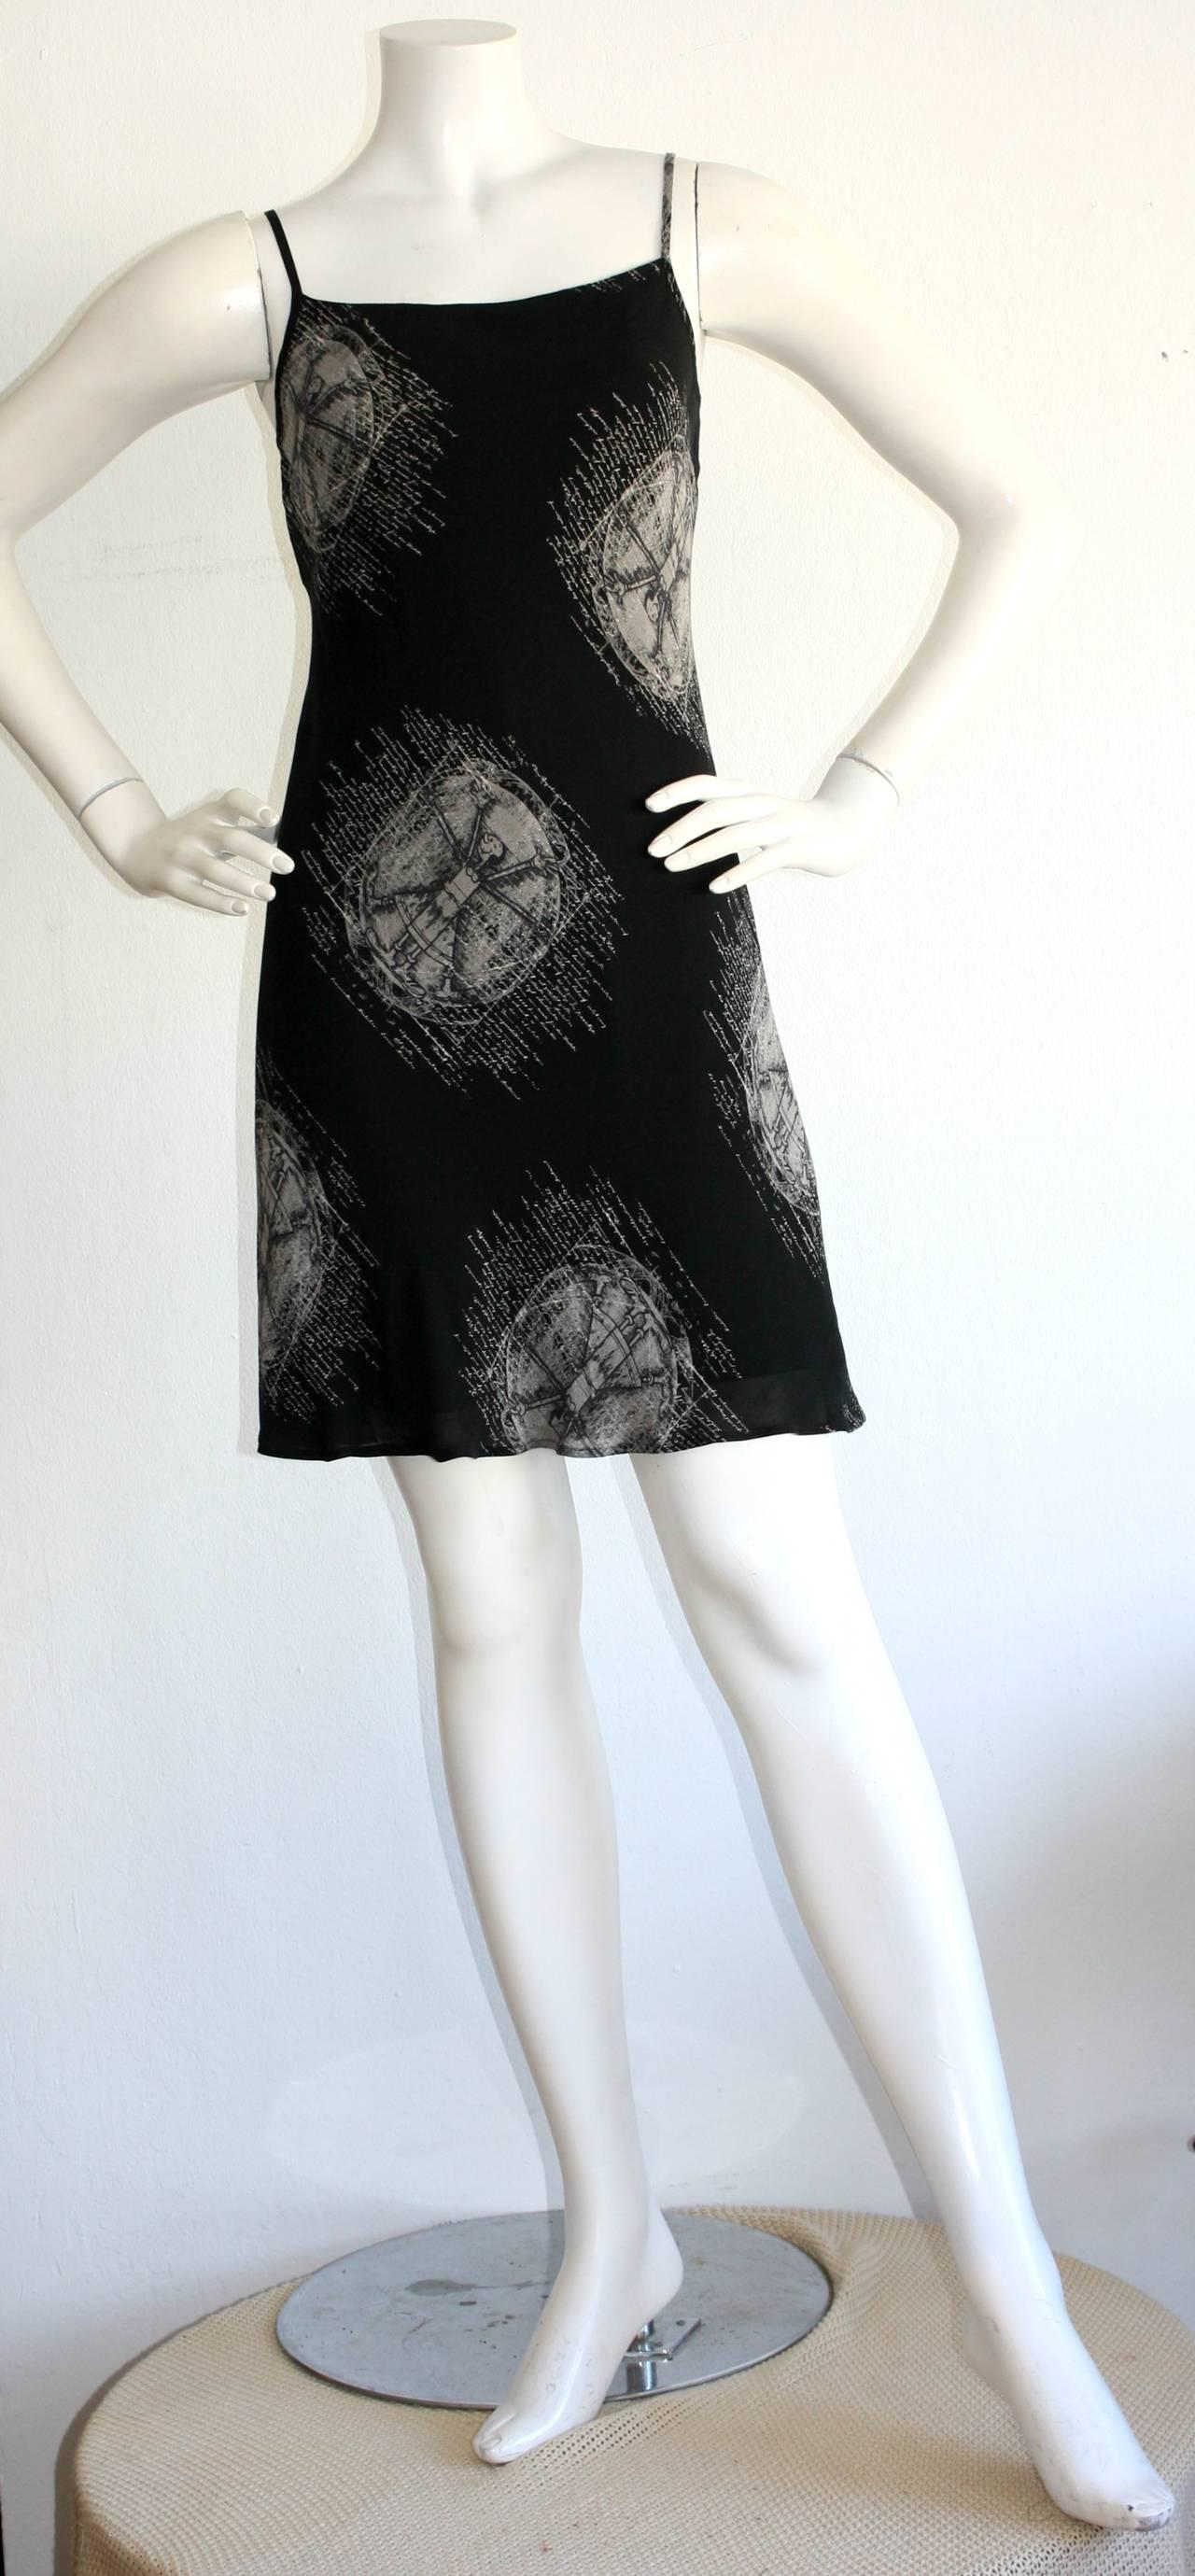 "Black 1990s Vintage Moschino Cheap & Chic Novelty Dress "" Olive Oyl On Bulls Eyes "" For Sale"